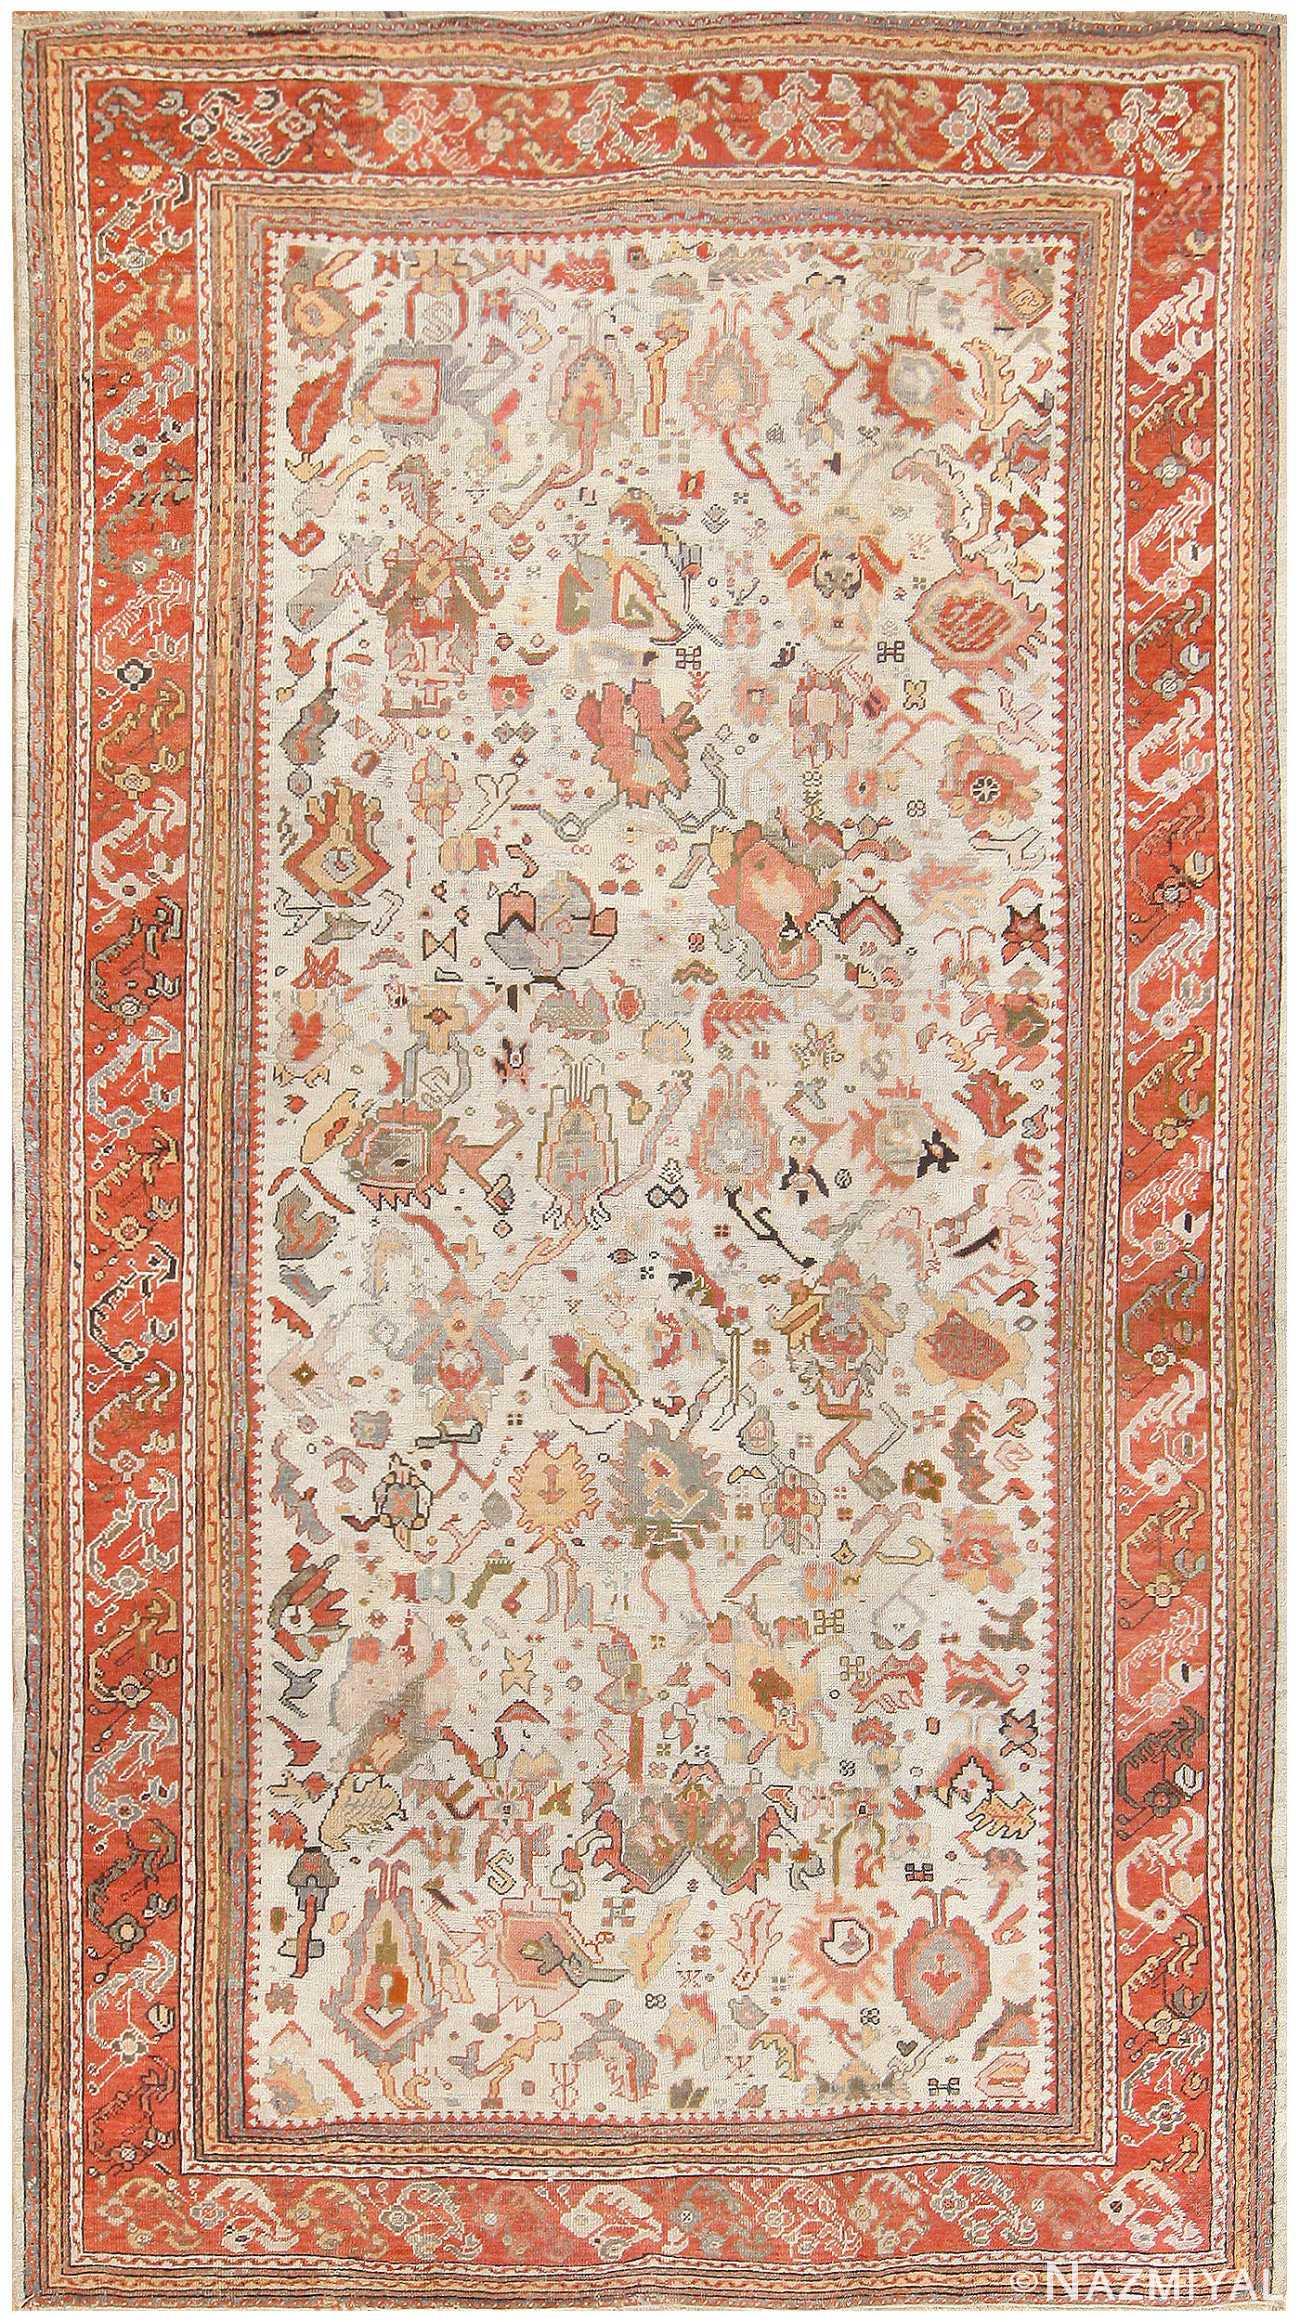 Antique Ghiordes Turkish Carpet 50133 Nazmiyal